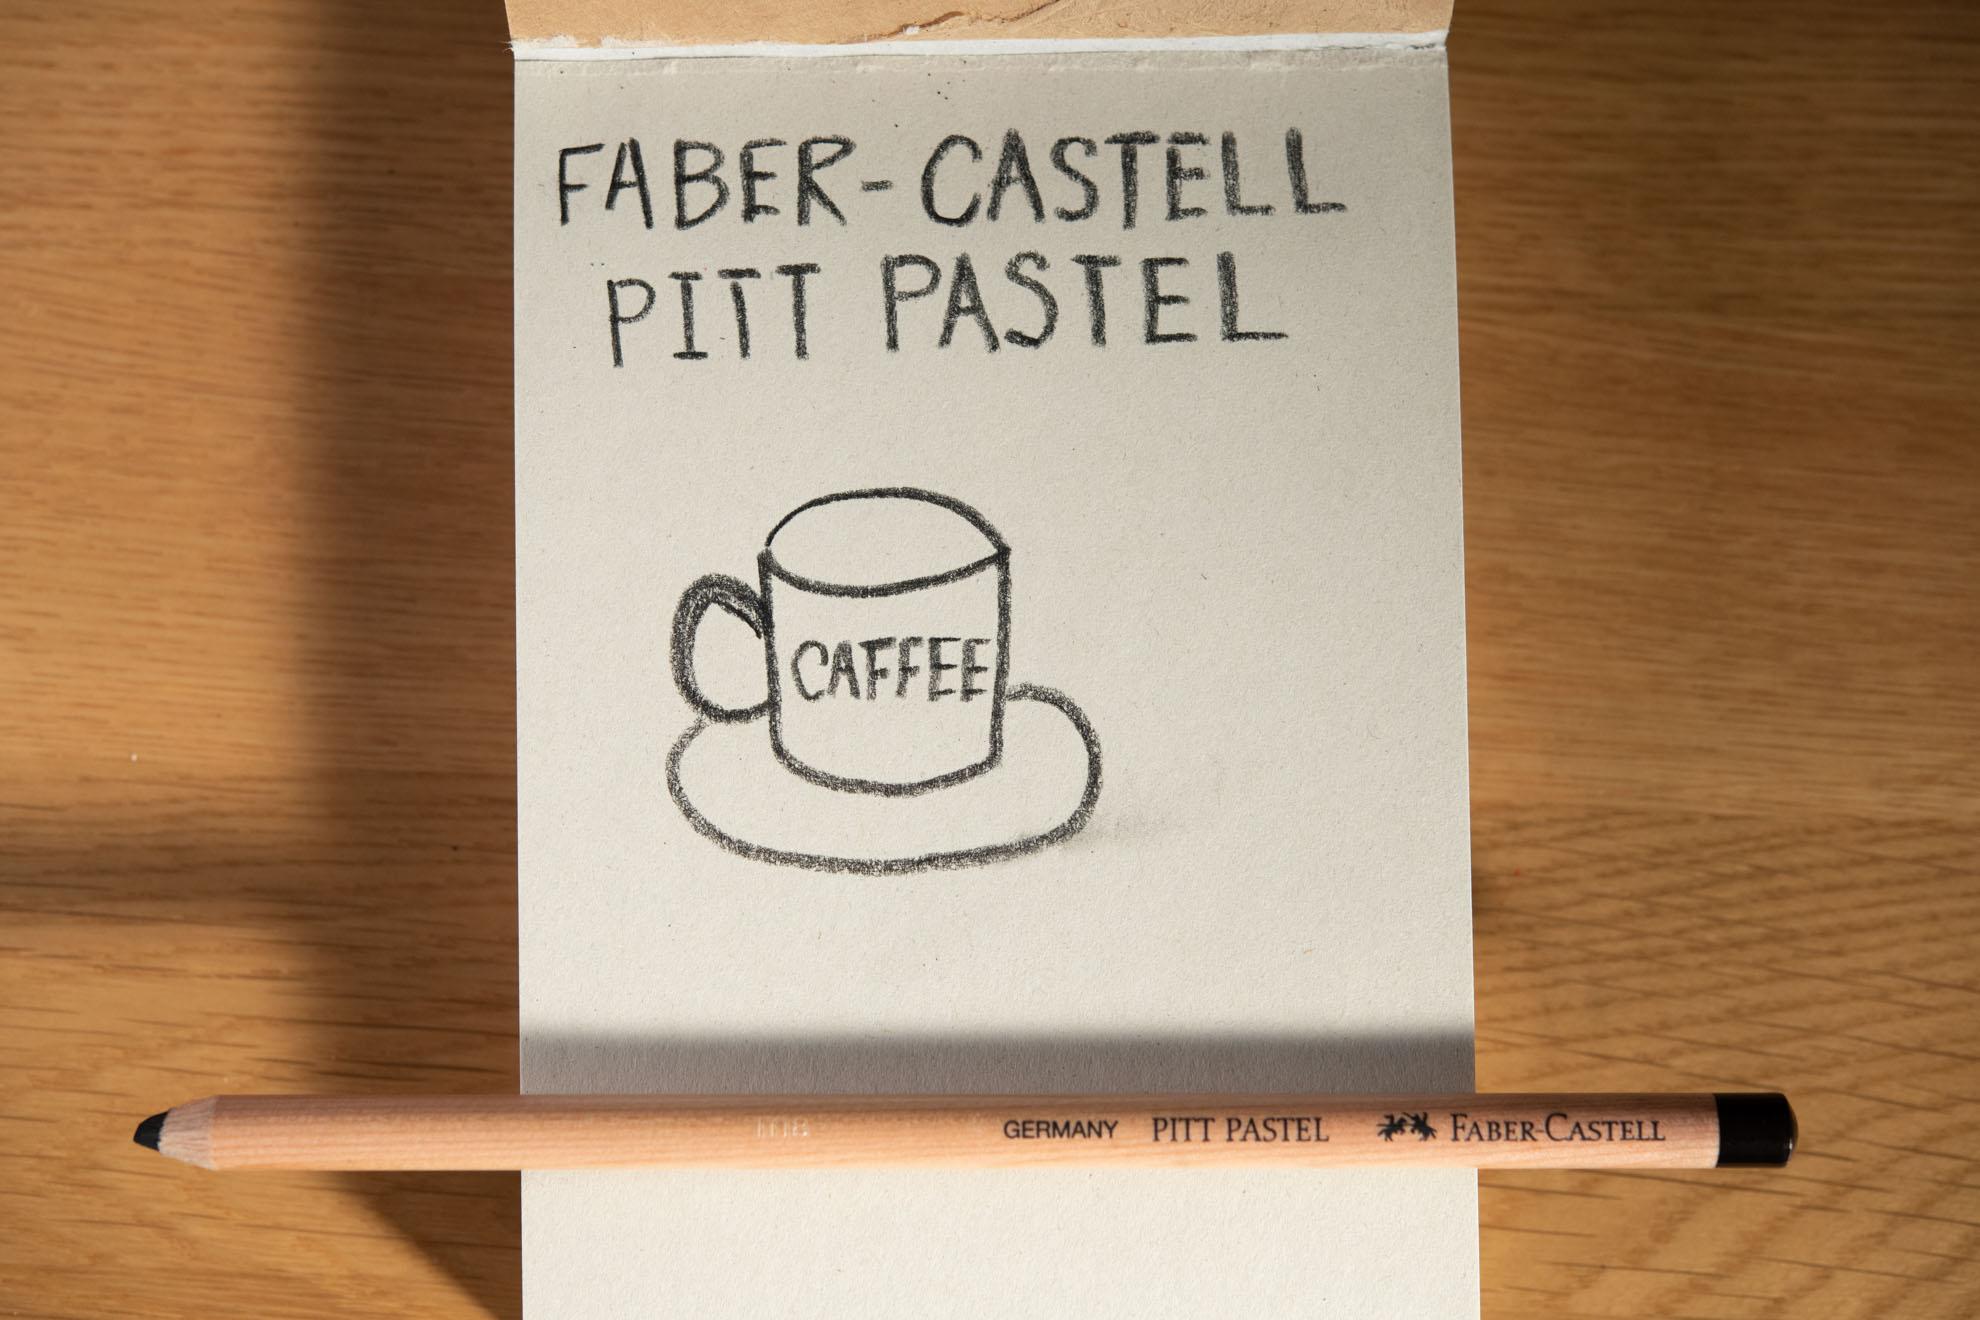 PITTパステル鉛筆 Faber-Castell